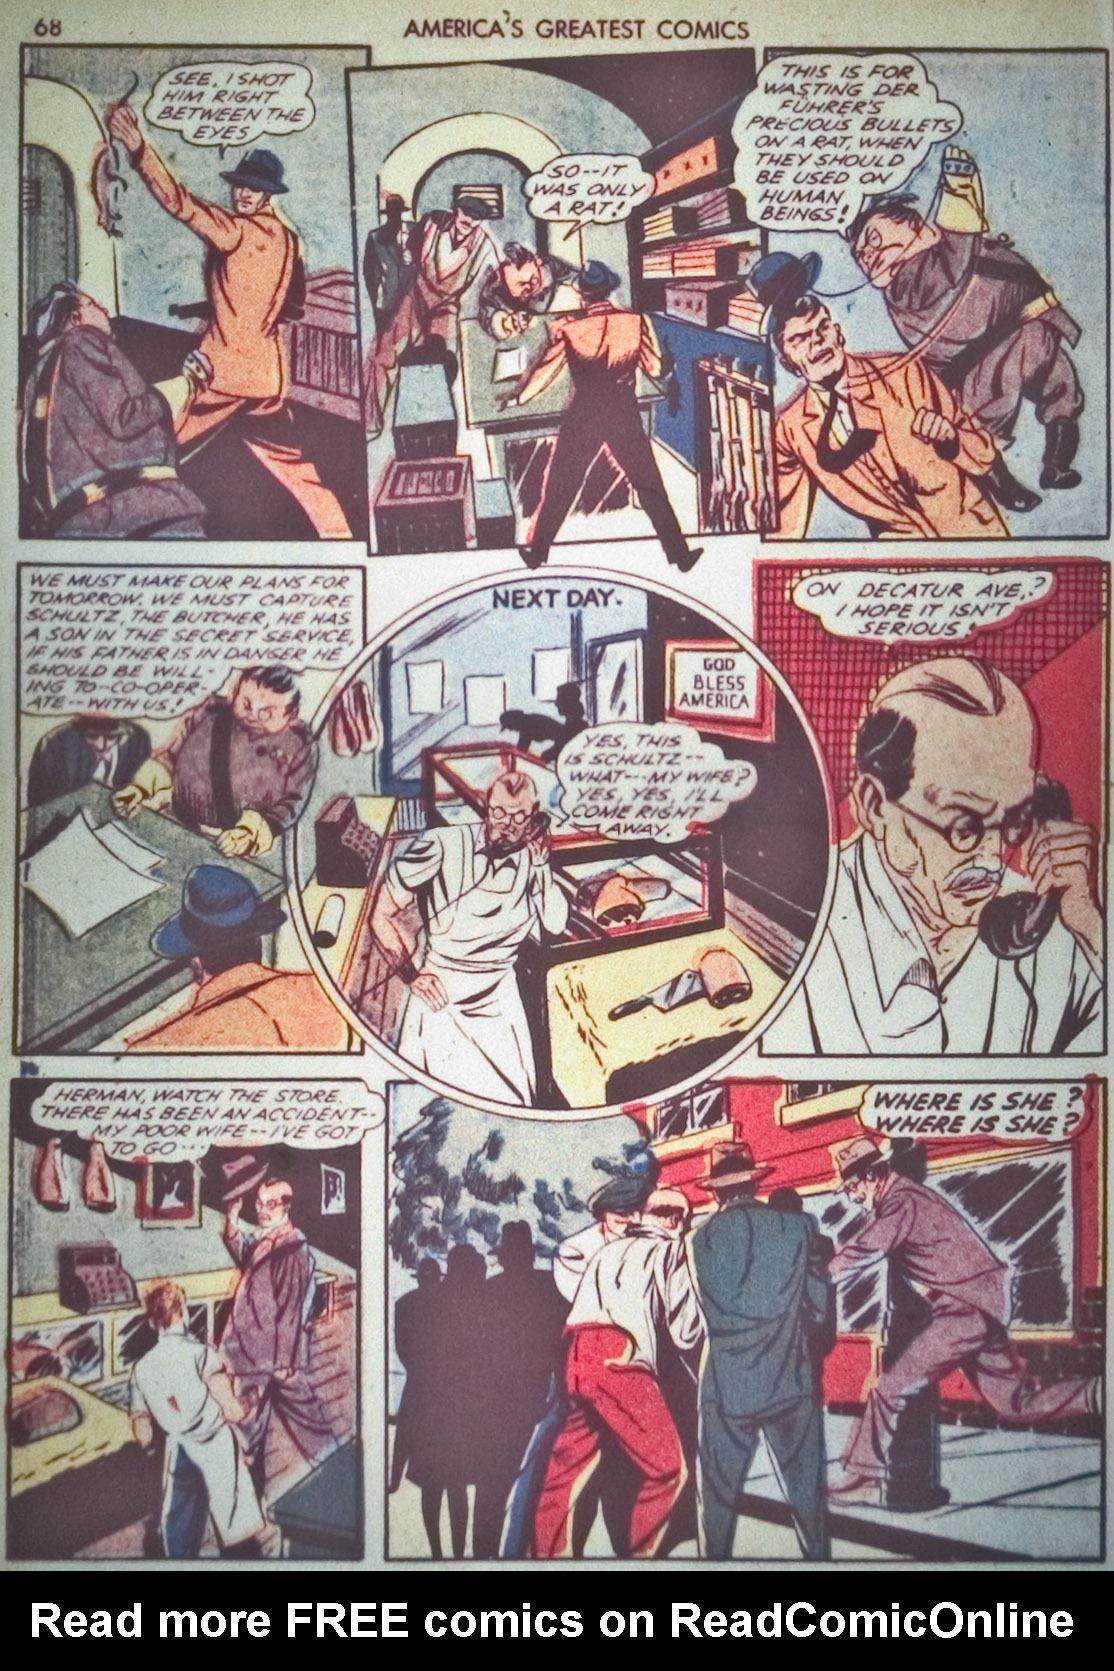 Read online America's Greatest Comics comic -  Issue #1 - 71